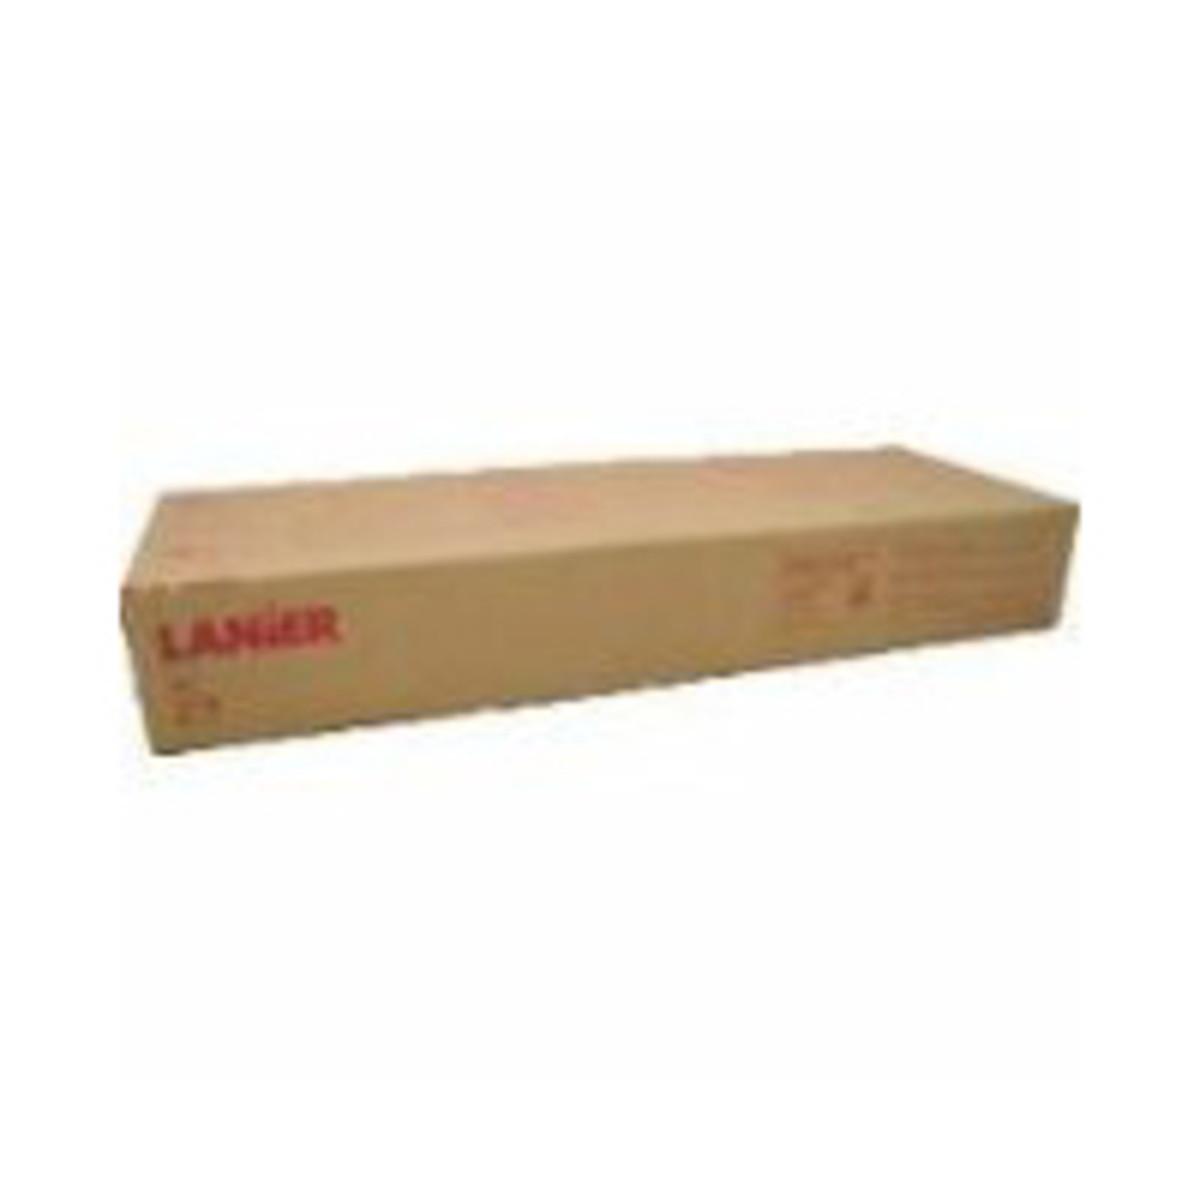 Lanier 888-338 Magenta Toner Cartridge